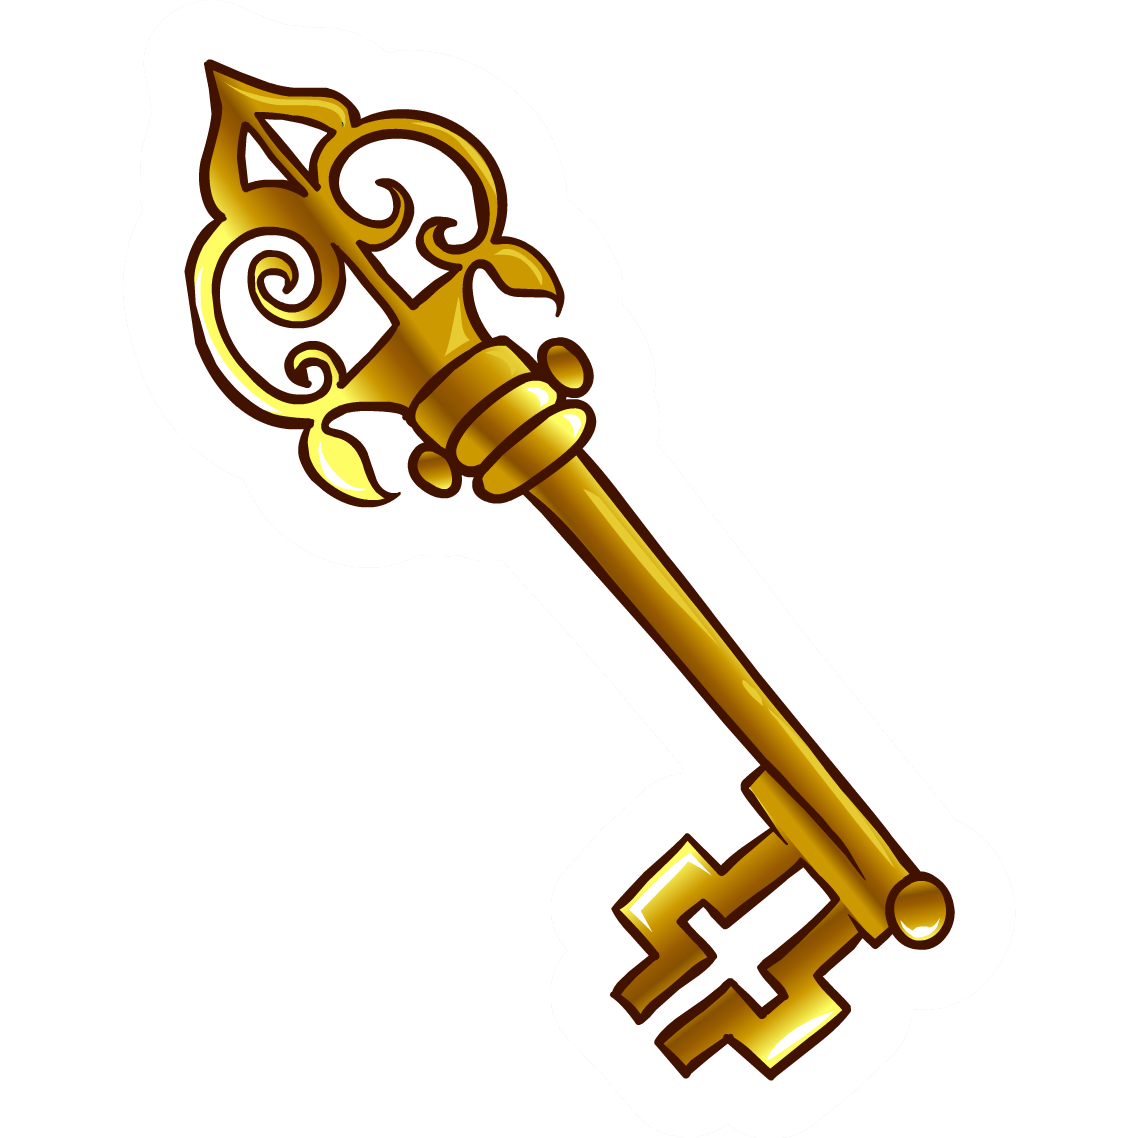 vector transparent  keys transparent fashioned. Old key clipart